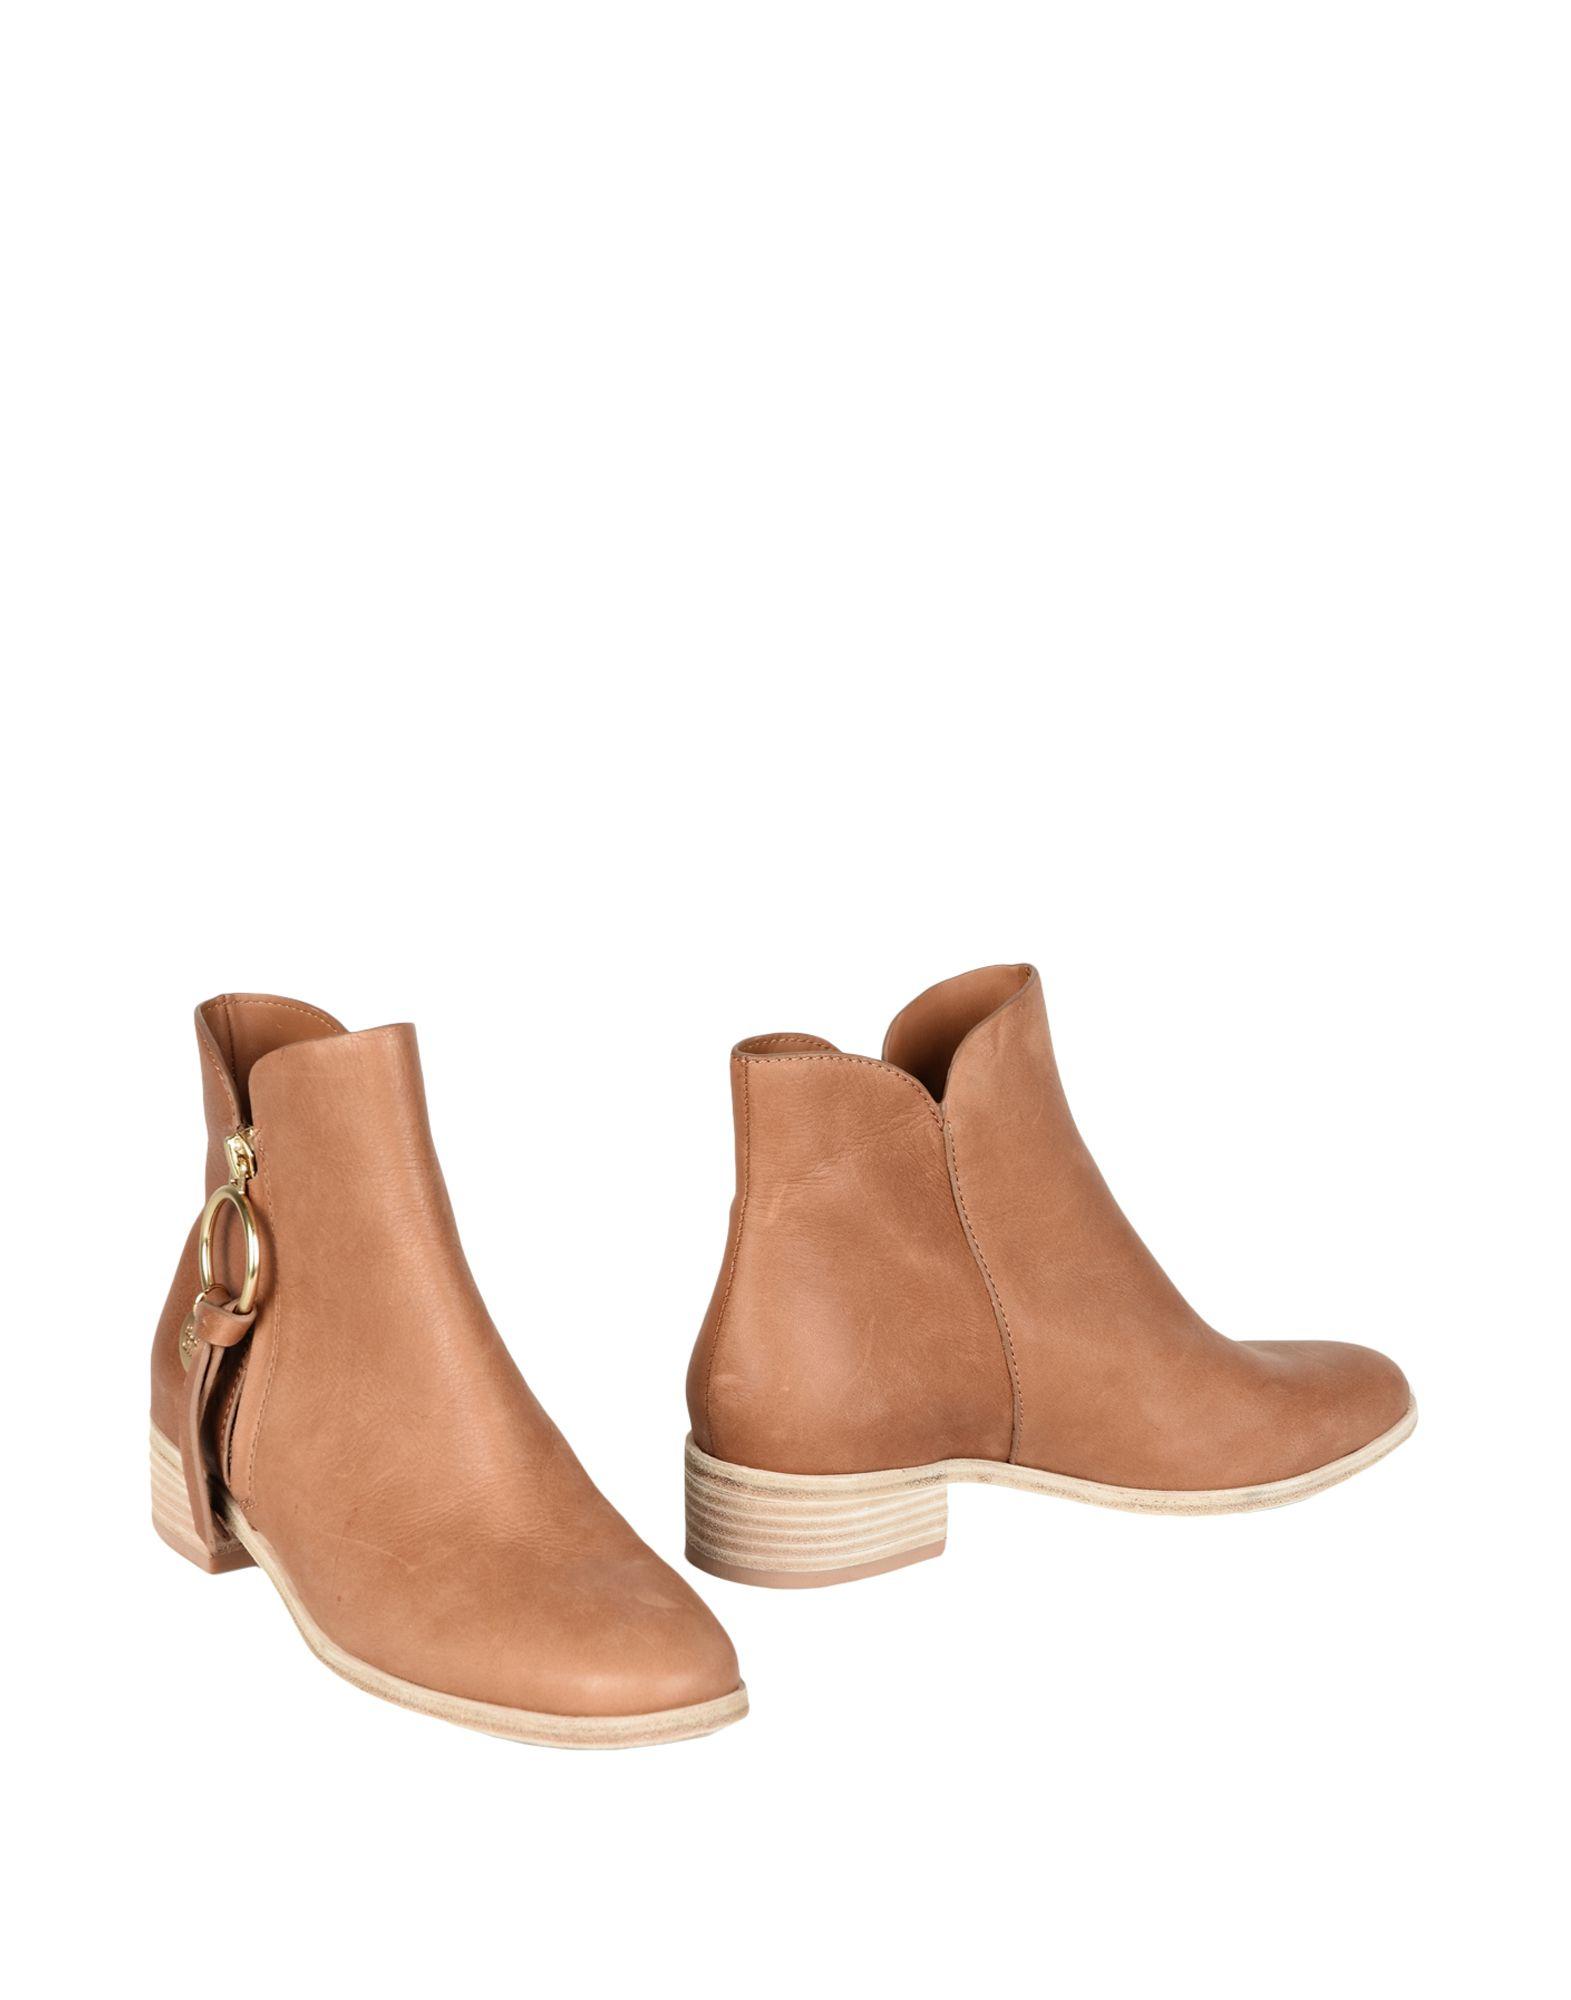 See By Chloé Stiefelette Damen Damen Damen  11380460SE Neue Schuhe 8995c1